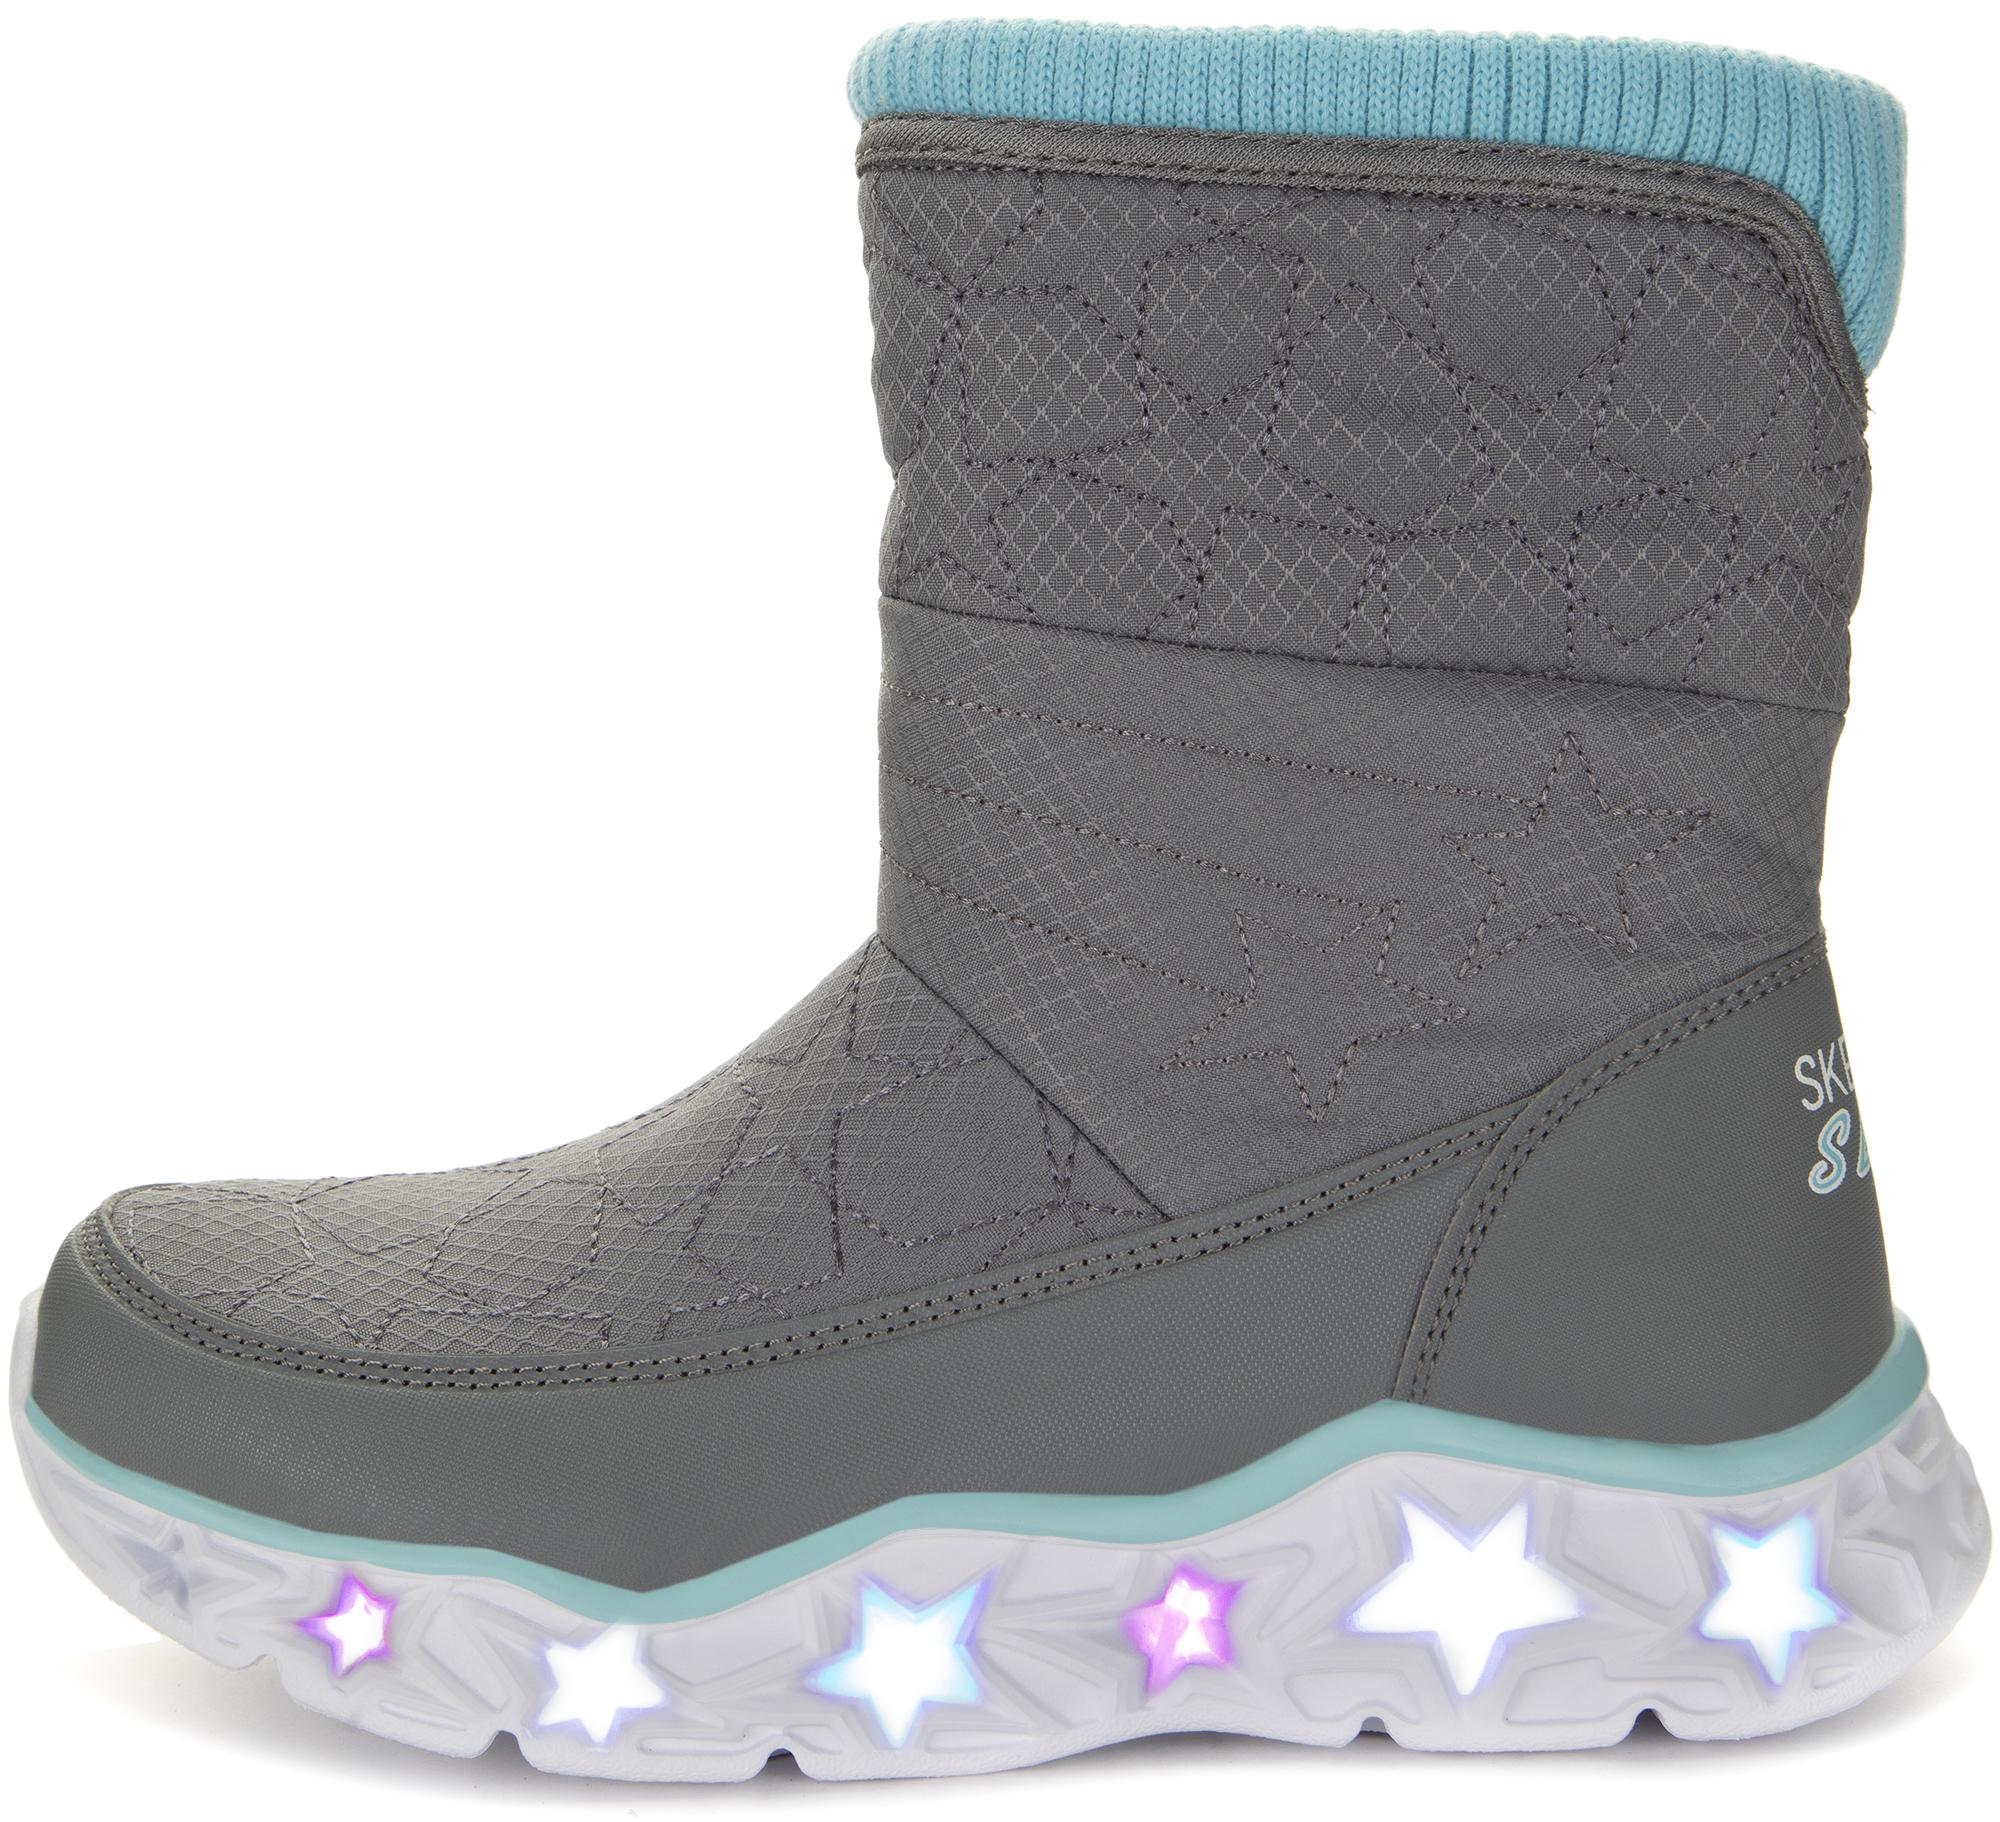 Skechers Сапоги для девочек Galaxy Lights-Star Brights, размер 33